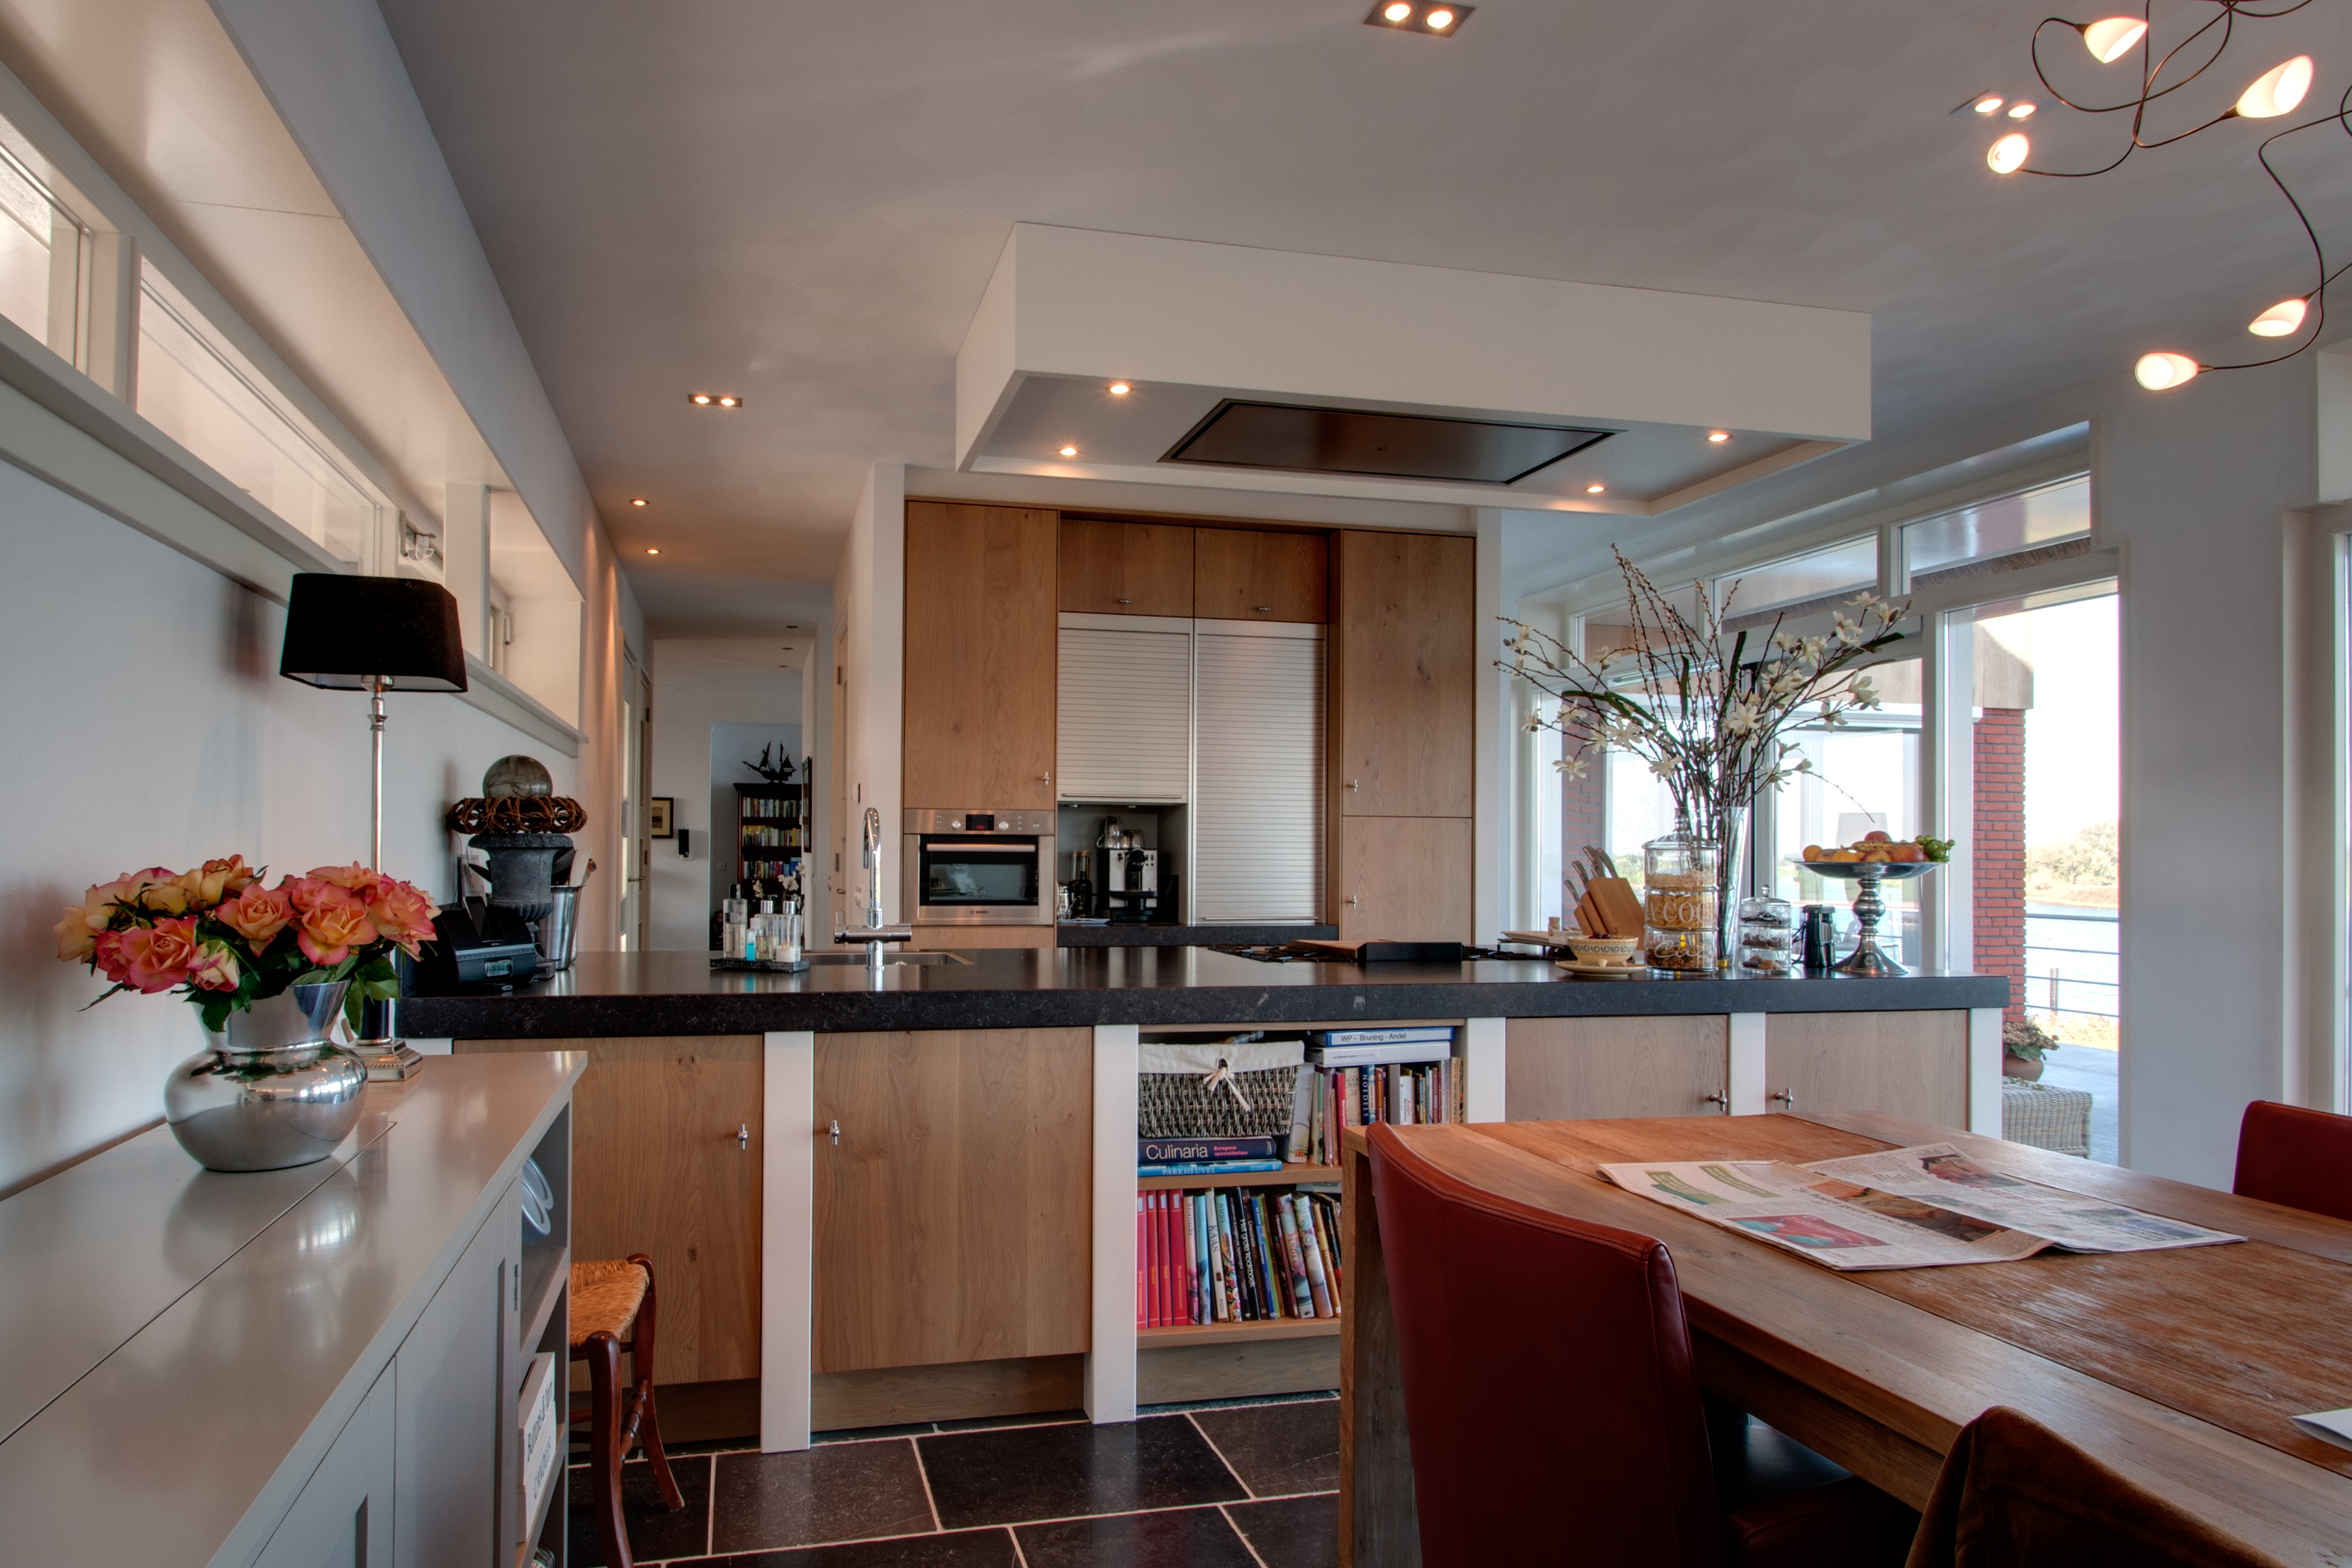 28_keuken